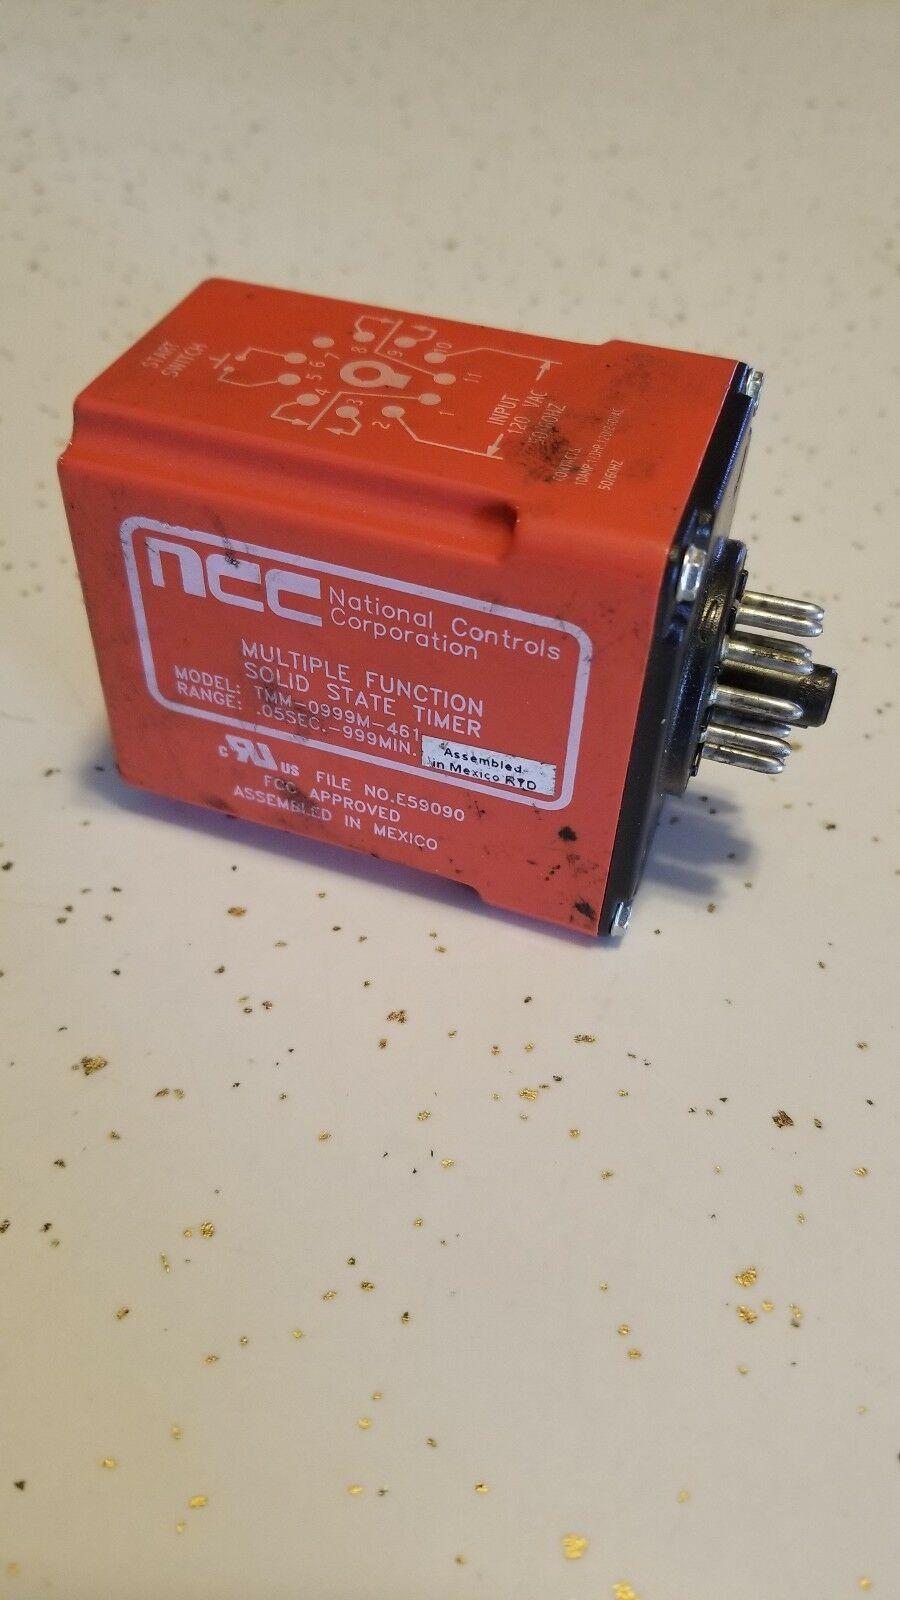 NCC TMM-0999M-461 SOLID STATE TIMER .05 SEC. -999 MIN.